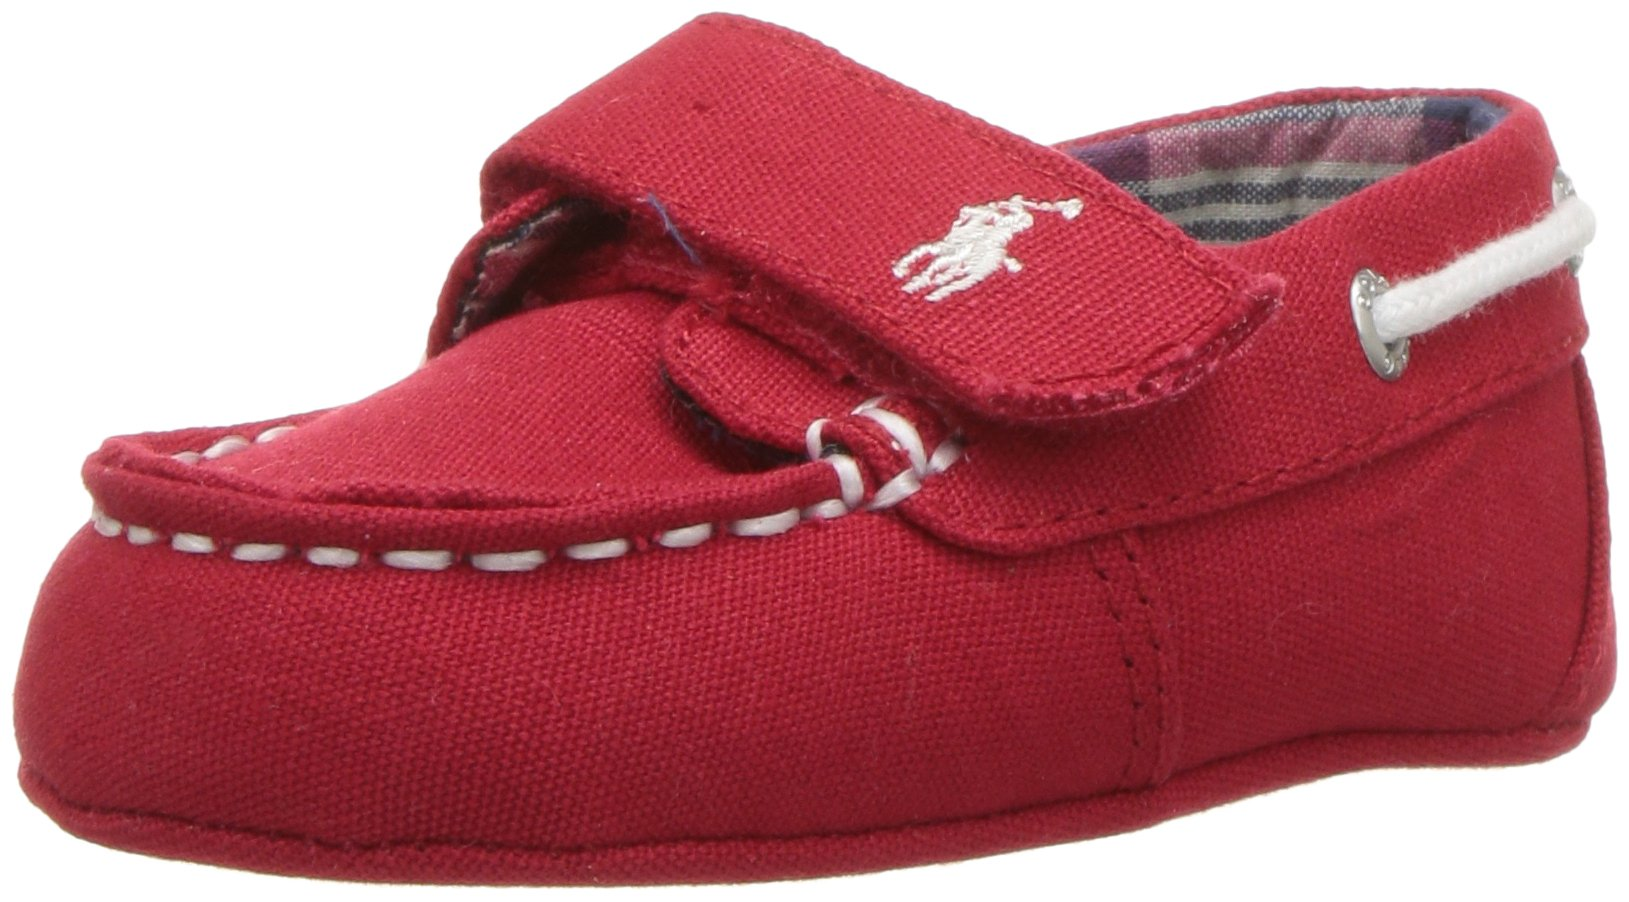 Polo Ralph Lauren Kids Boys' Sander EZ Crib Shoe, Red, 0 M US Infant